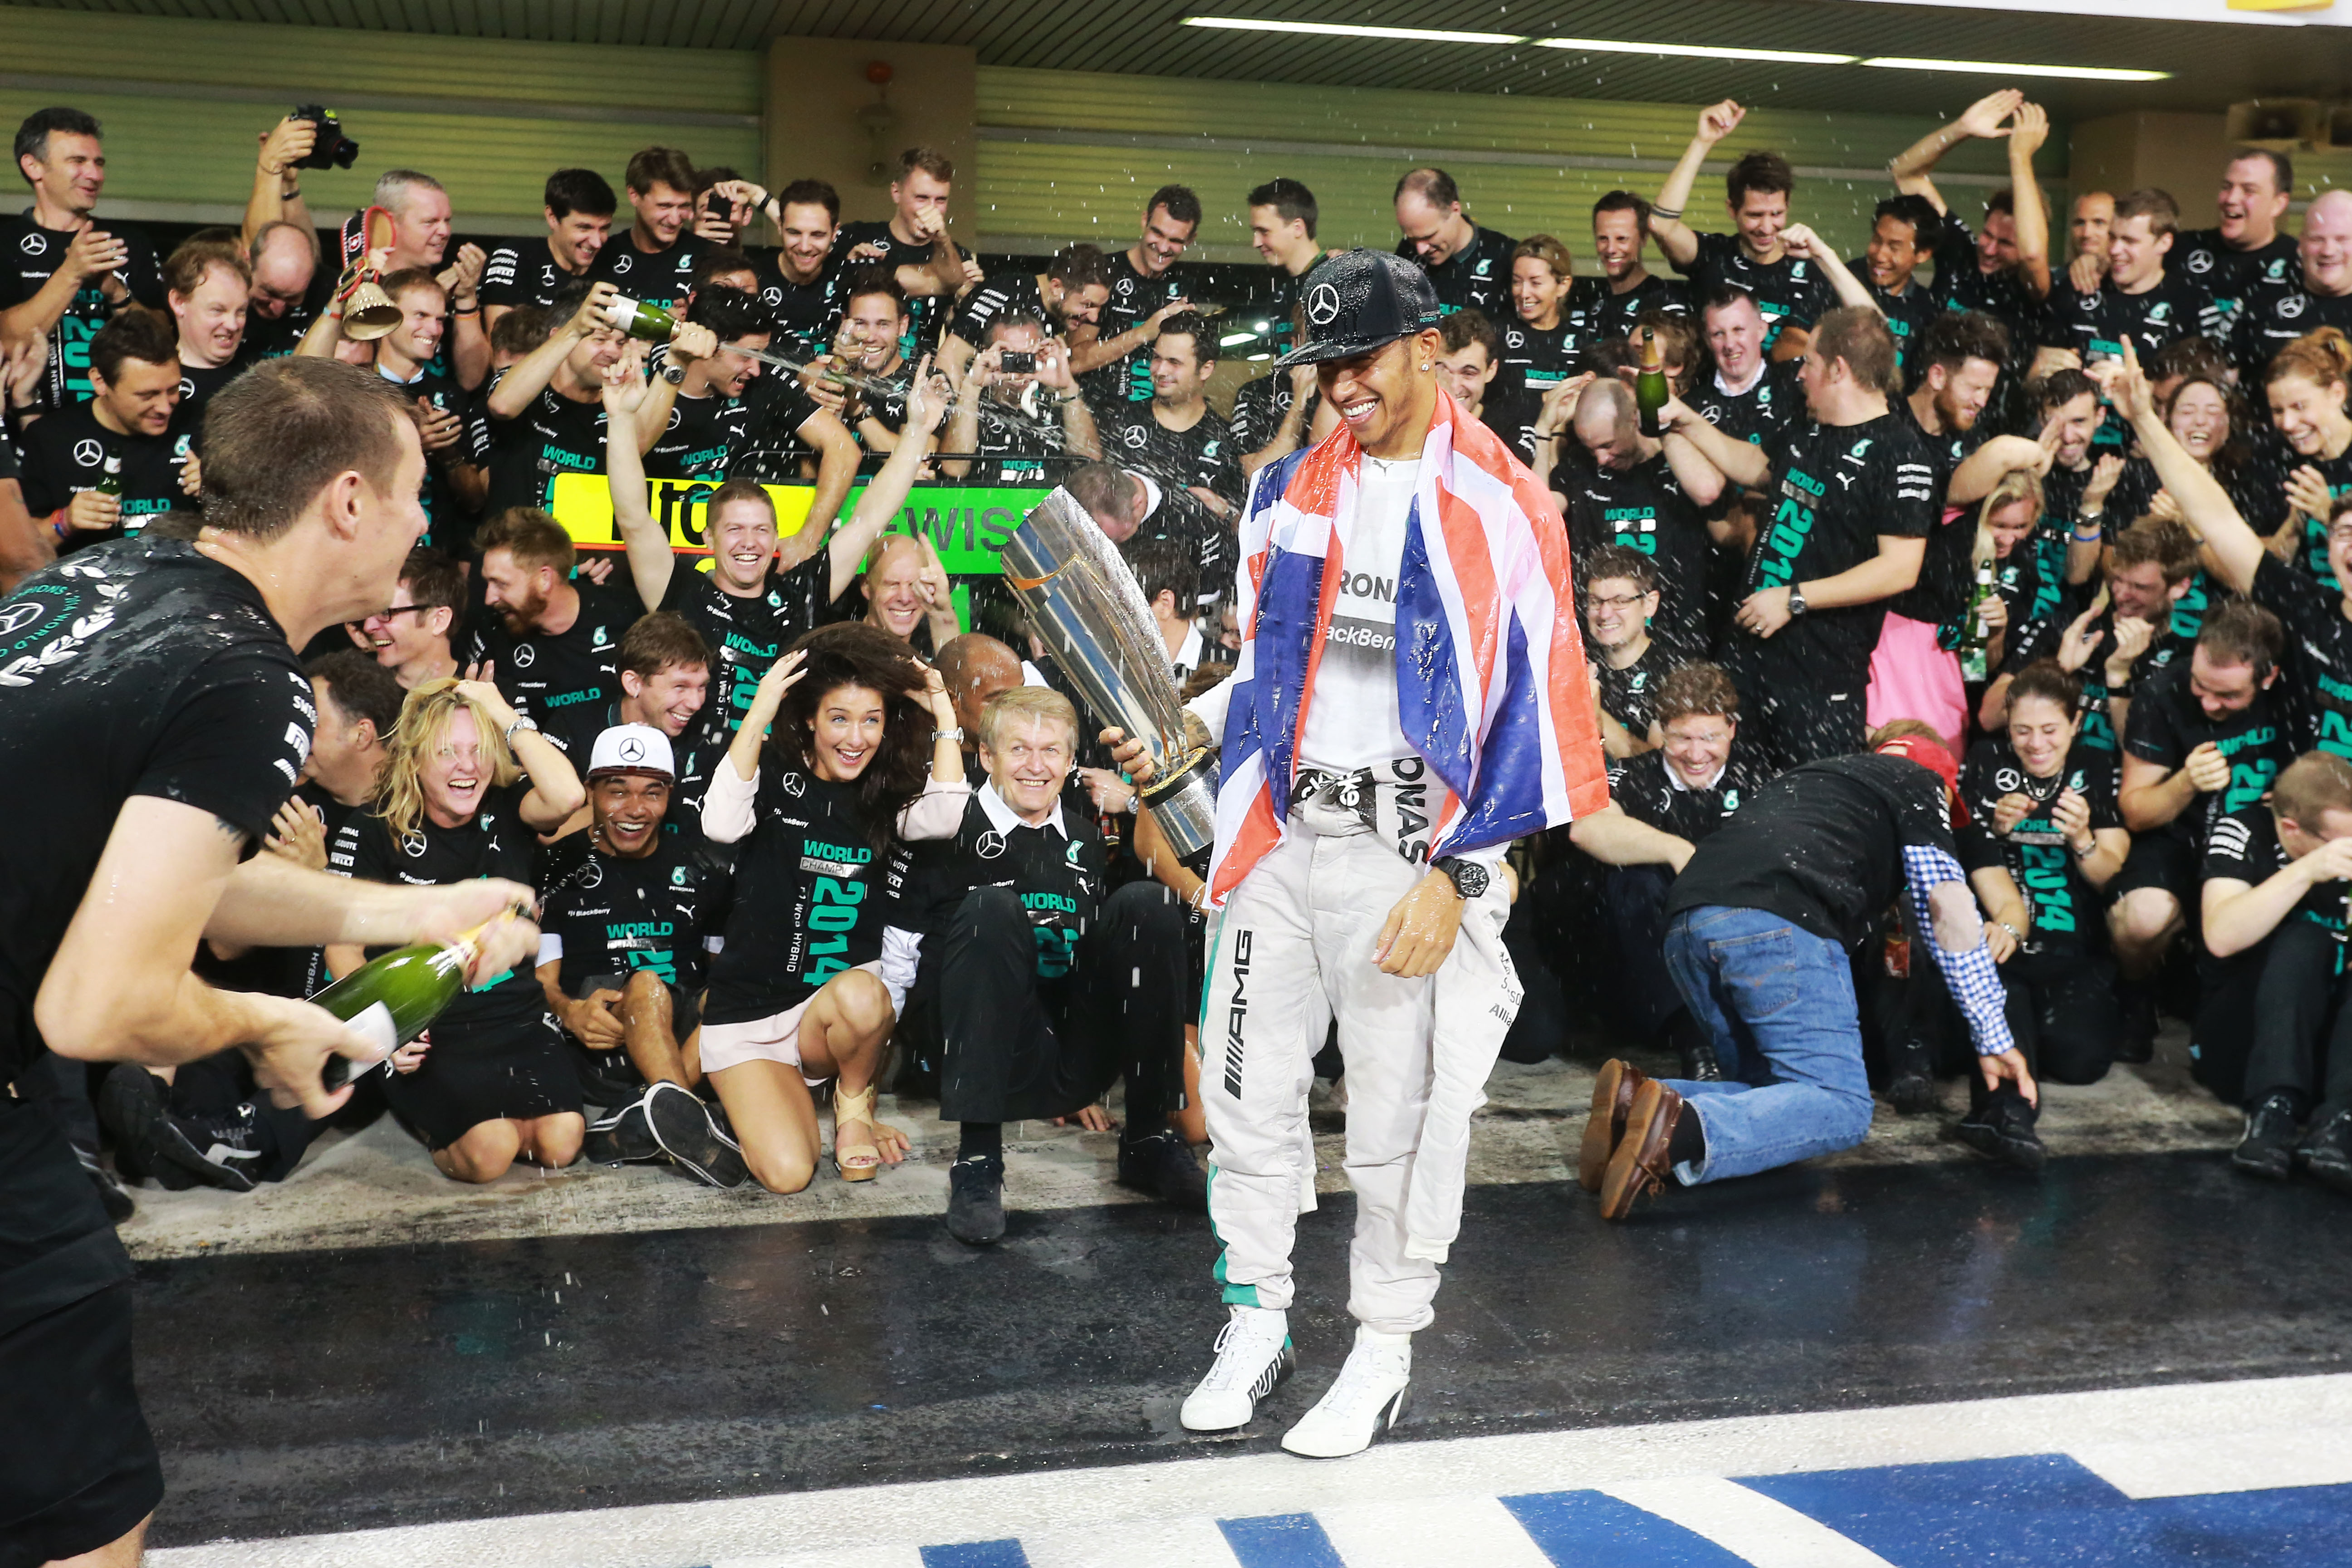 Lewis Hamilton wins 2014 F1 title